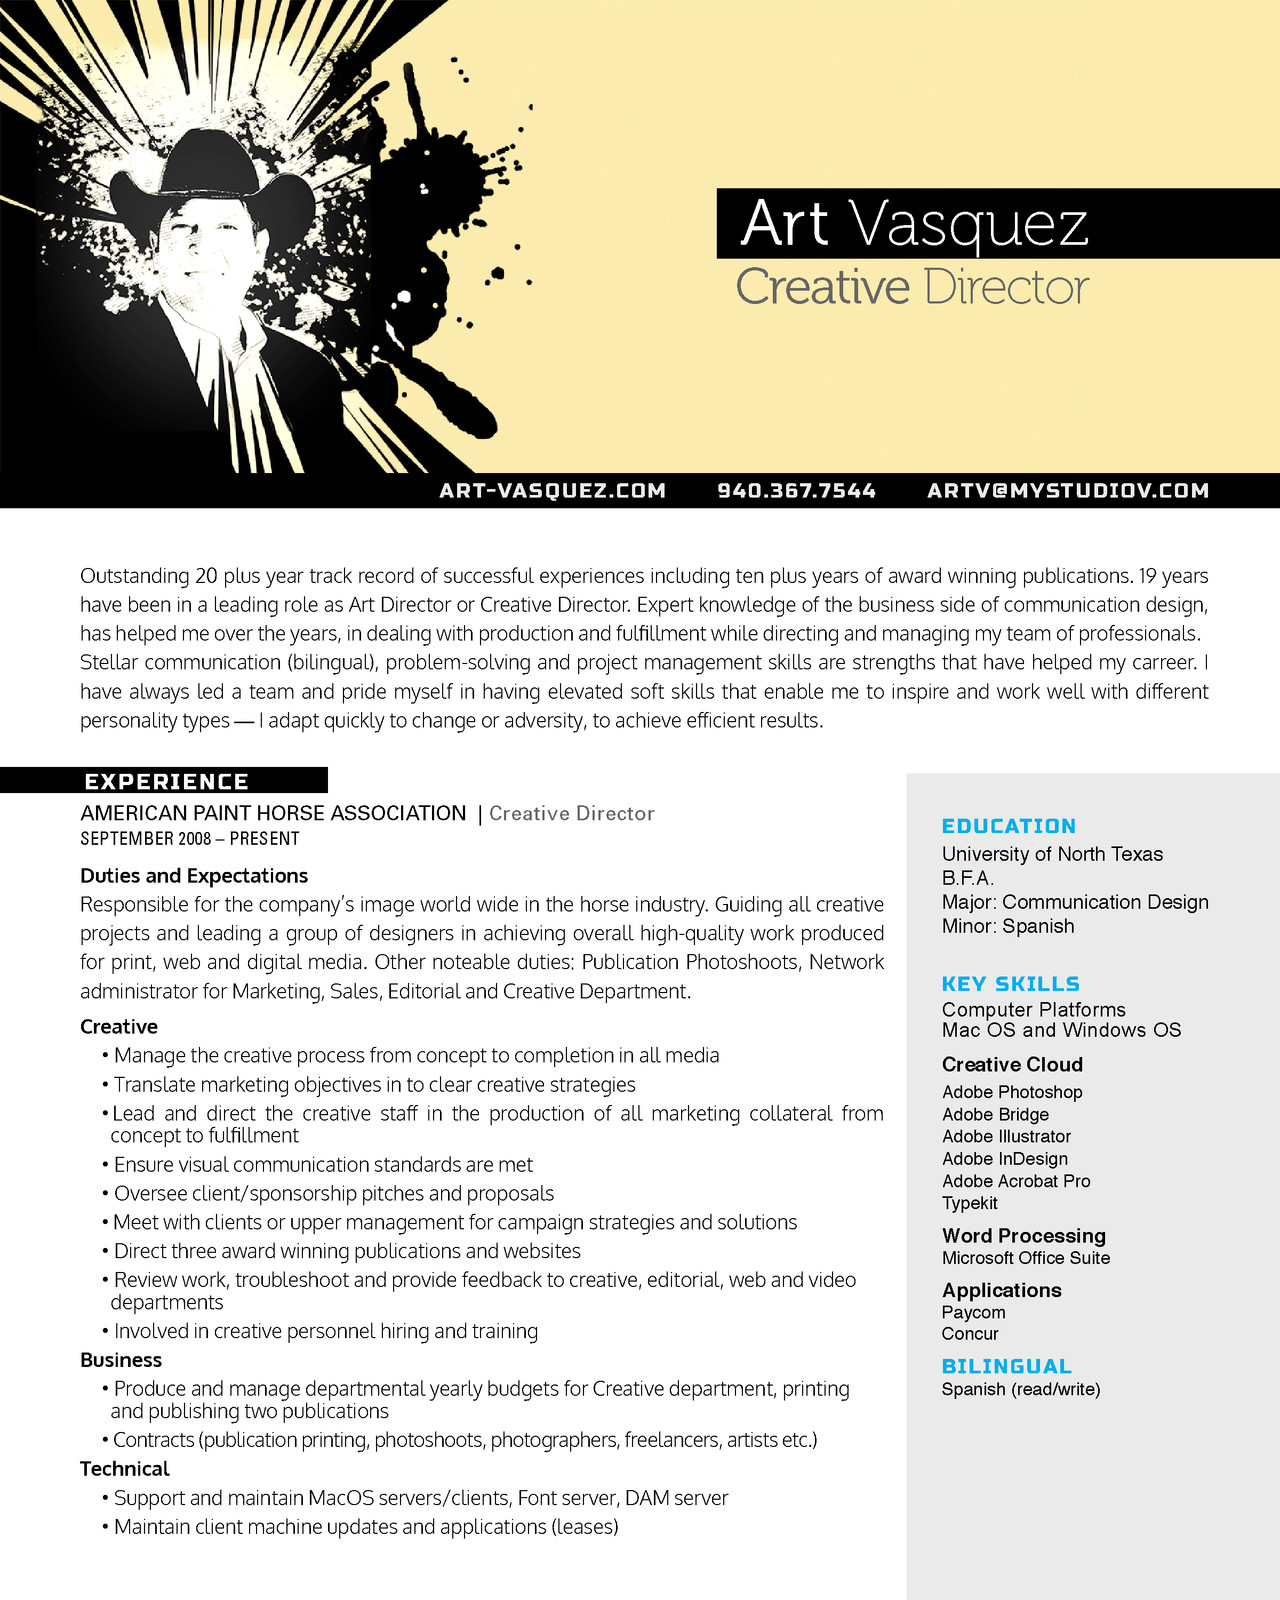 duties of a creative director